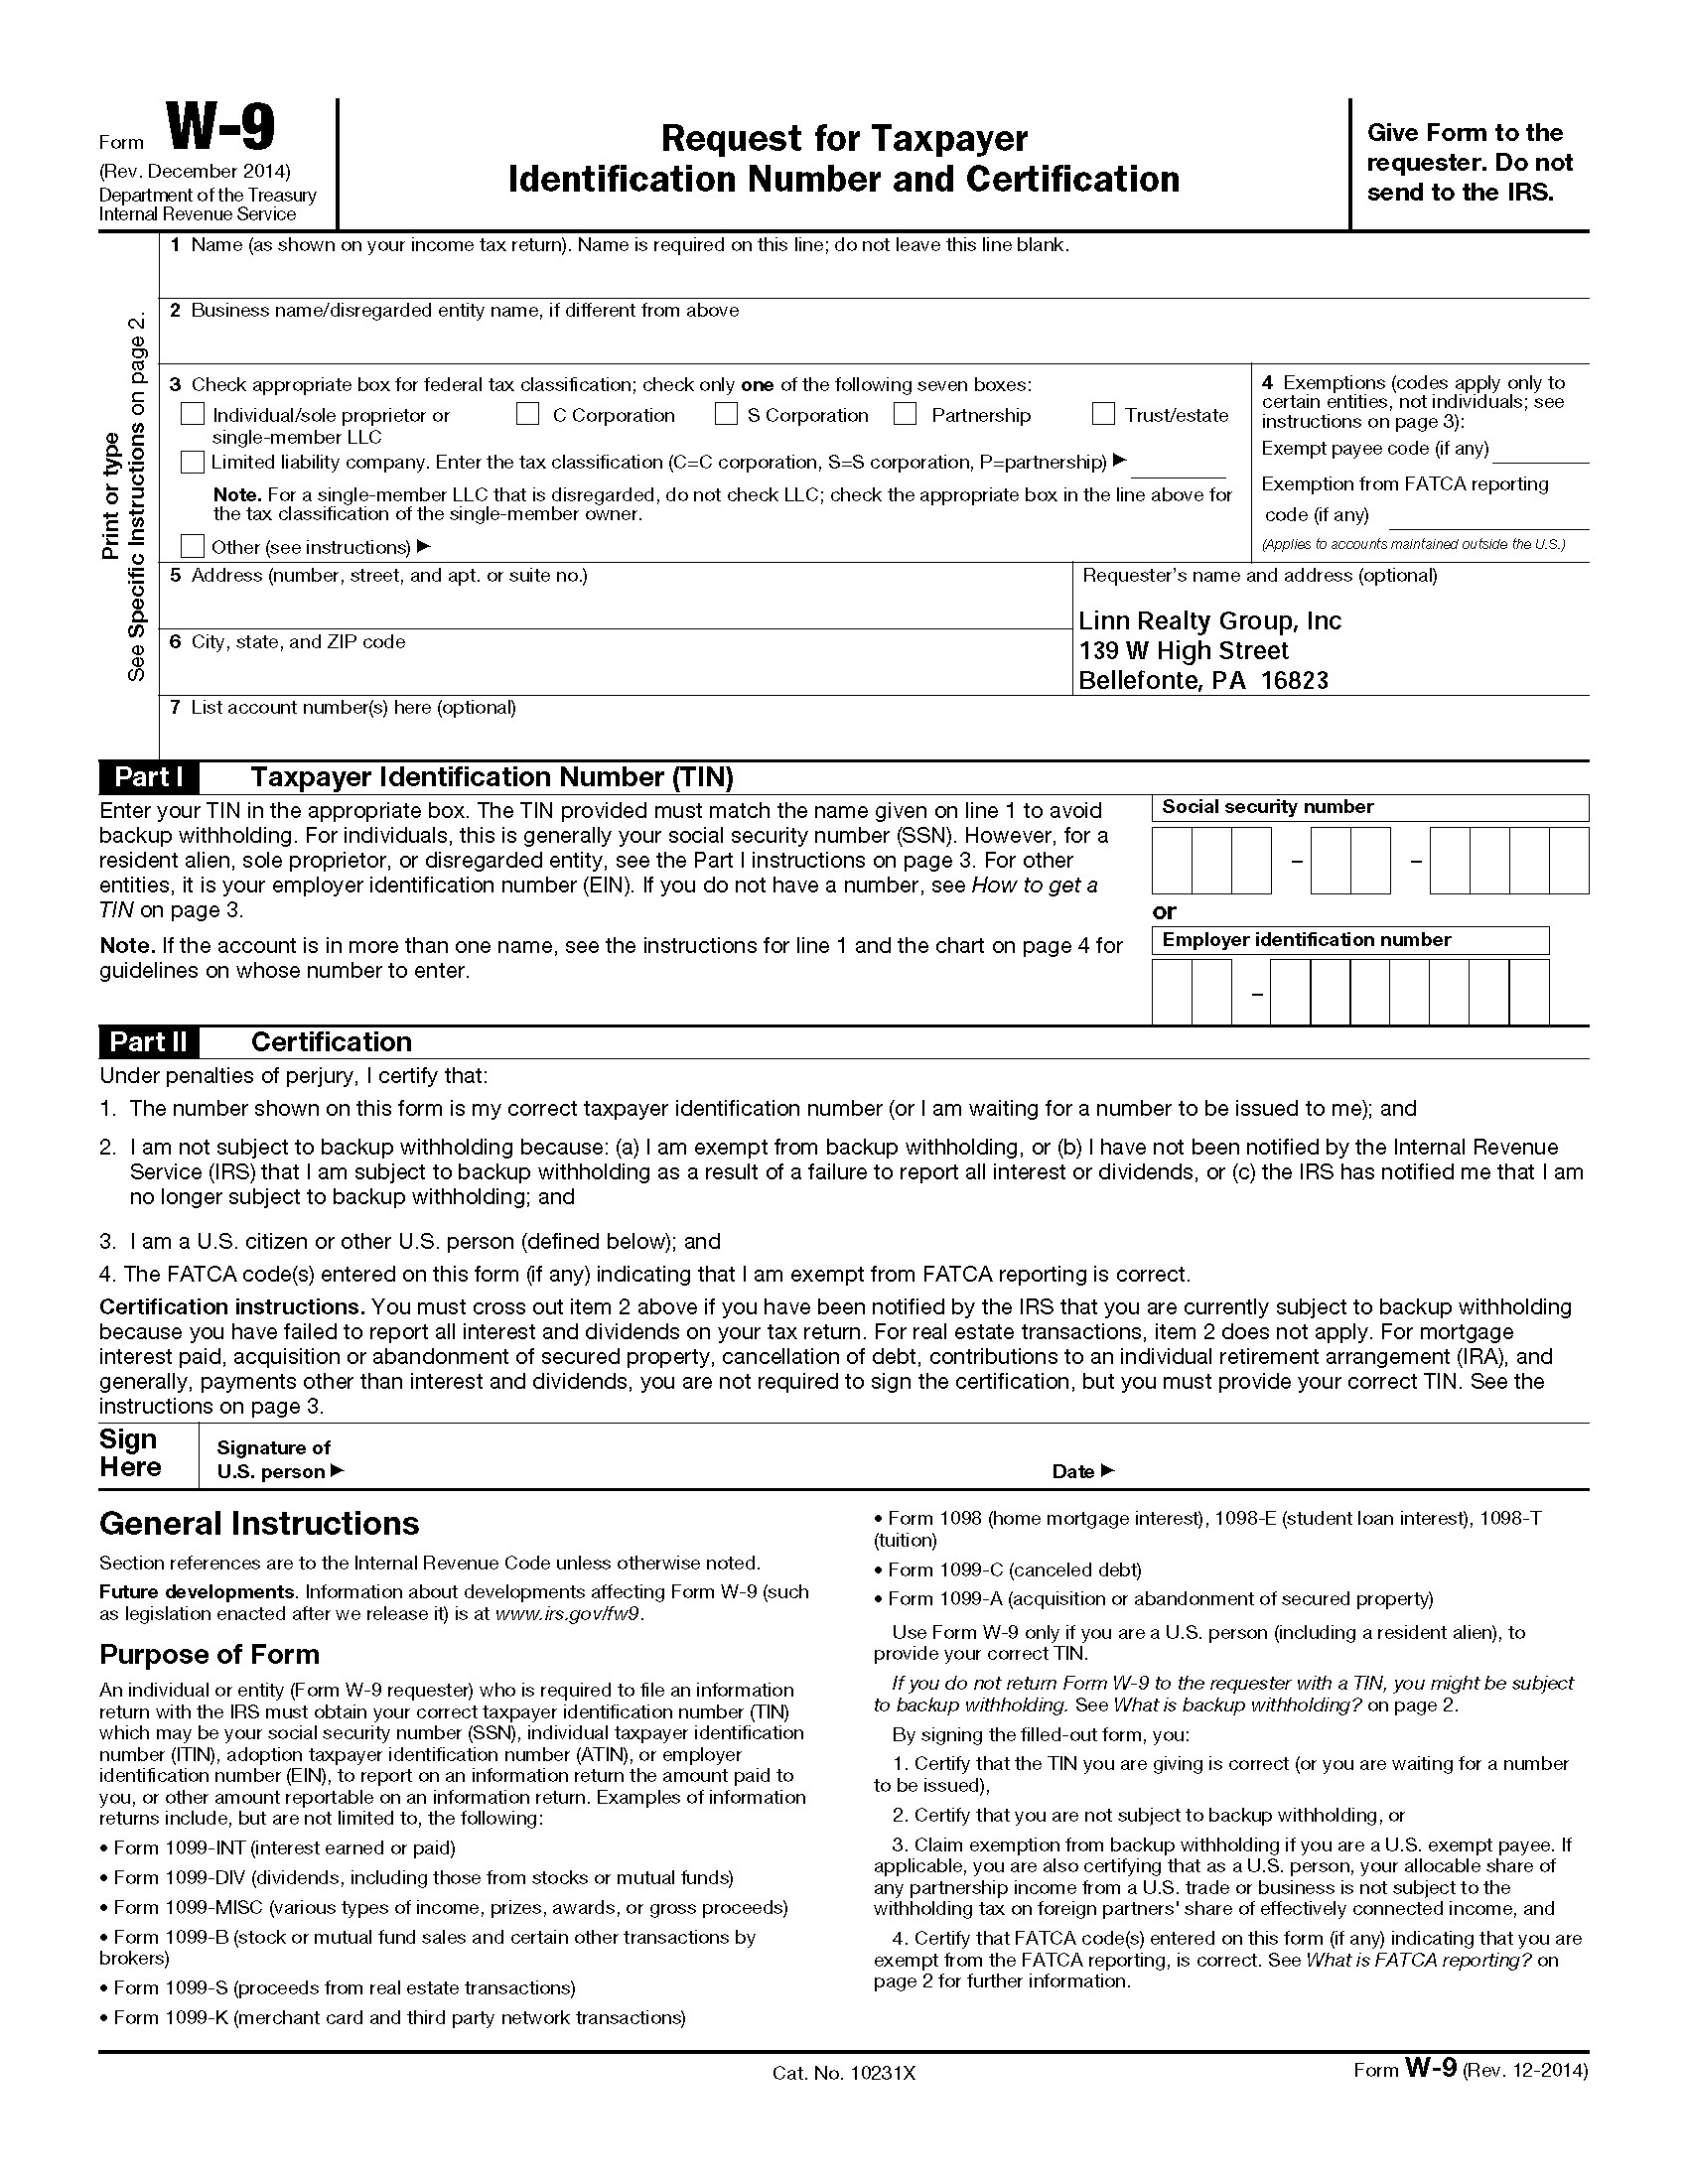 W-9 Form 2021 Printable Pdf | Calendar Printables Free Blank inside Blank I 9 Form 2021